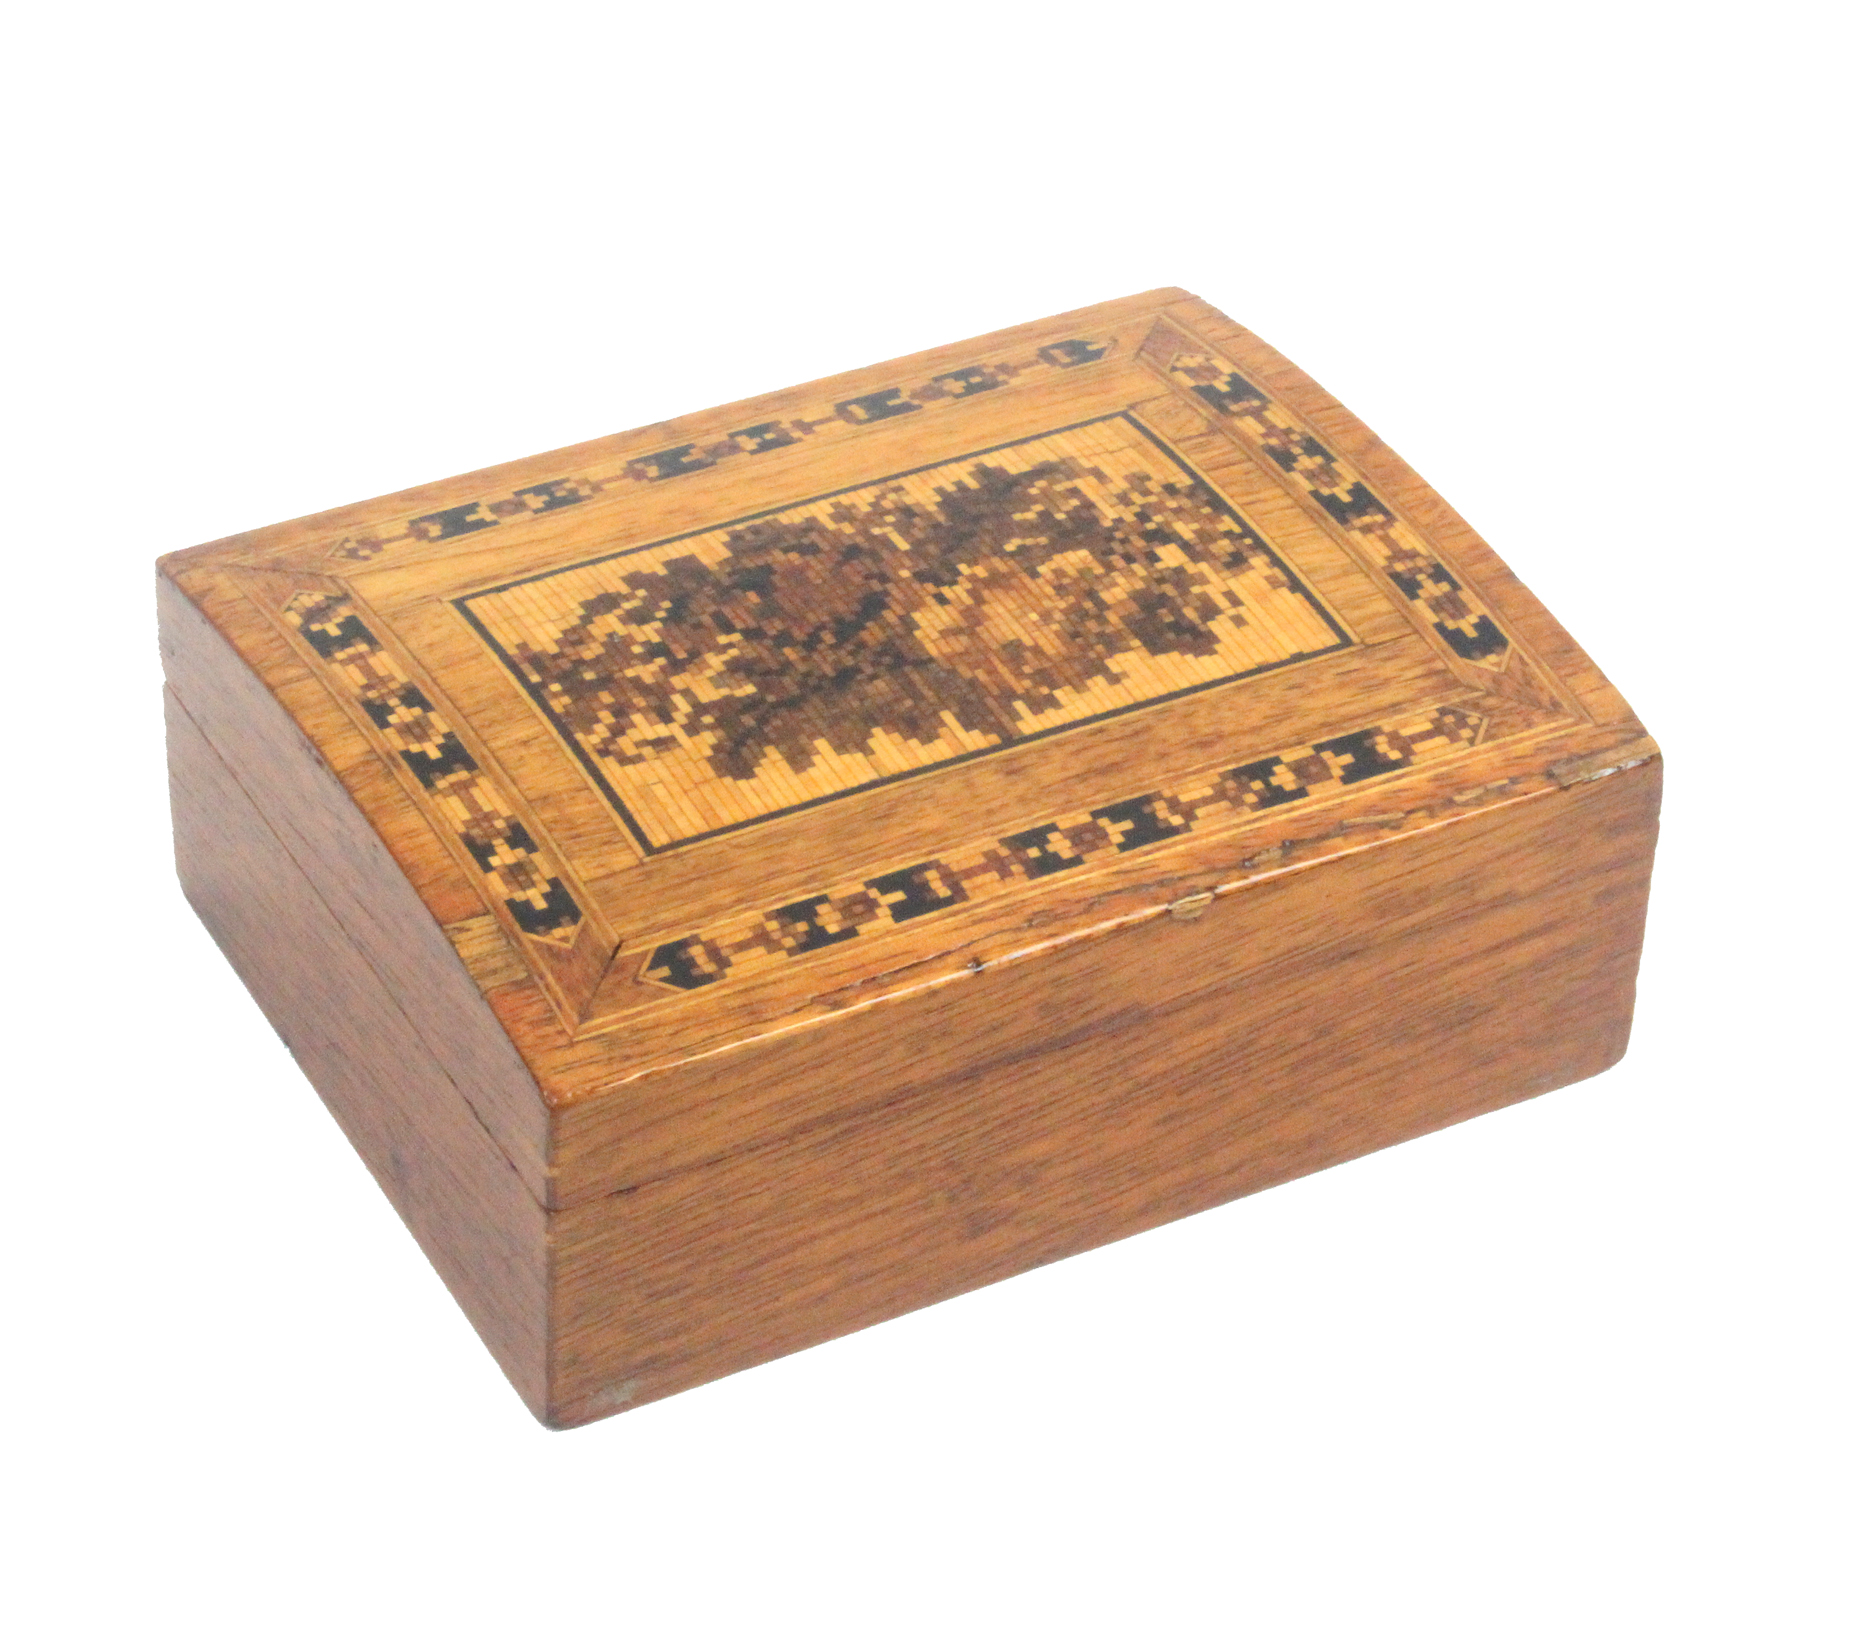 An early 20th Tunbridge ware box by, The Tunbridge Wells Manufacturing Co, Ltd, of rectangular form,